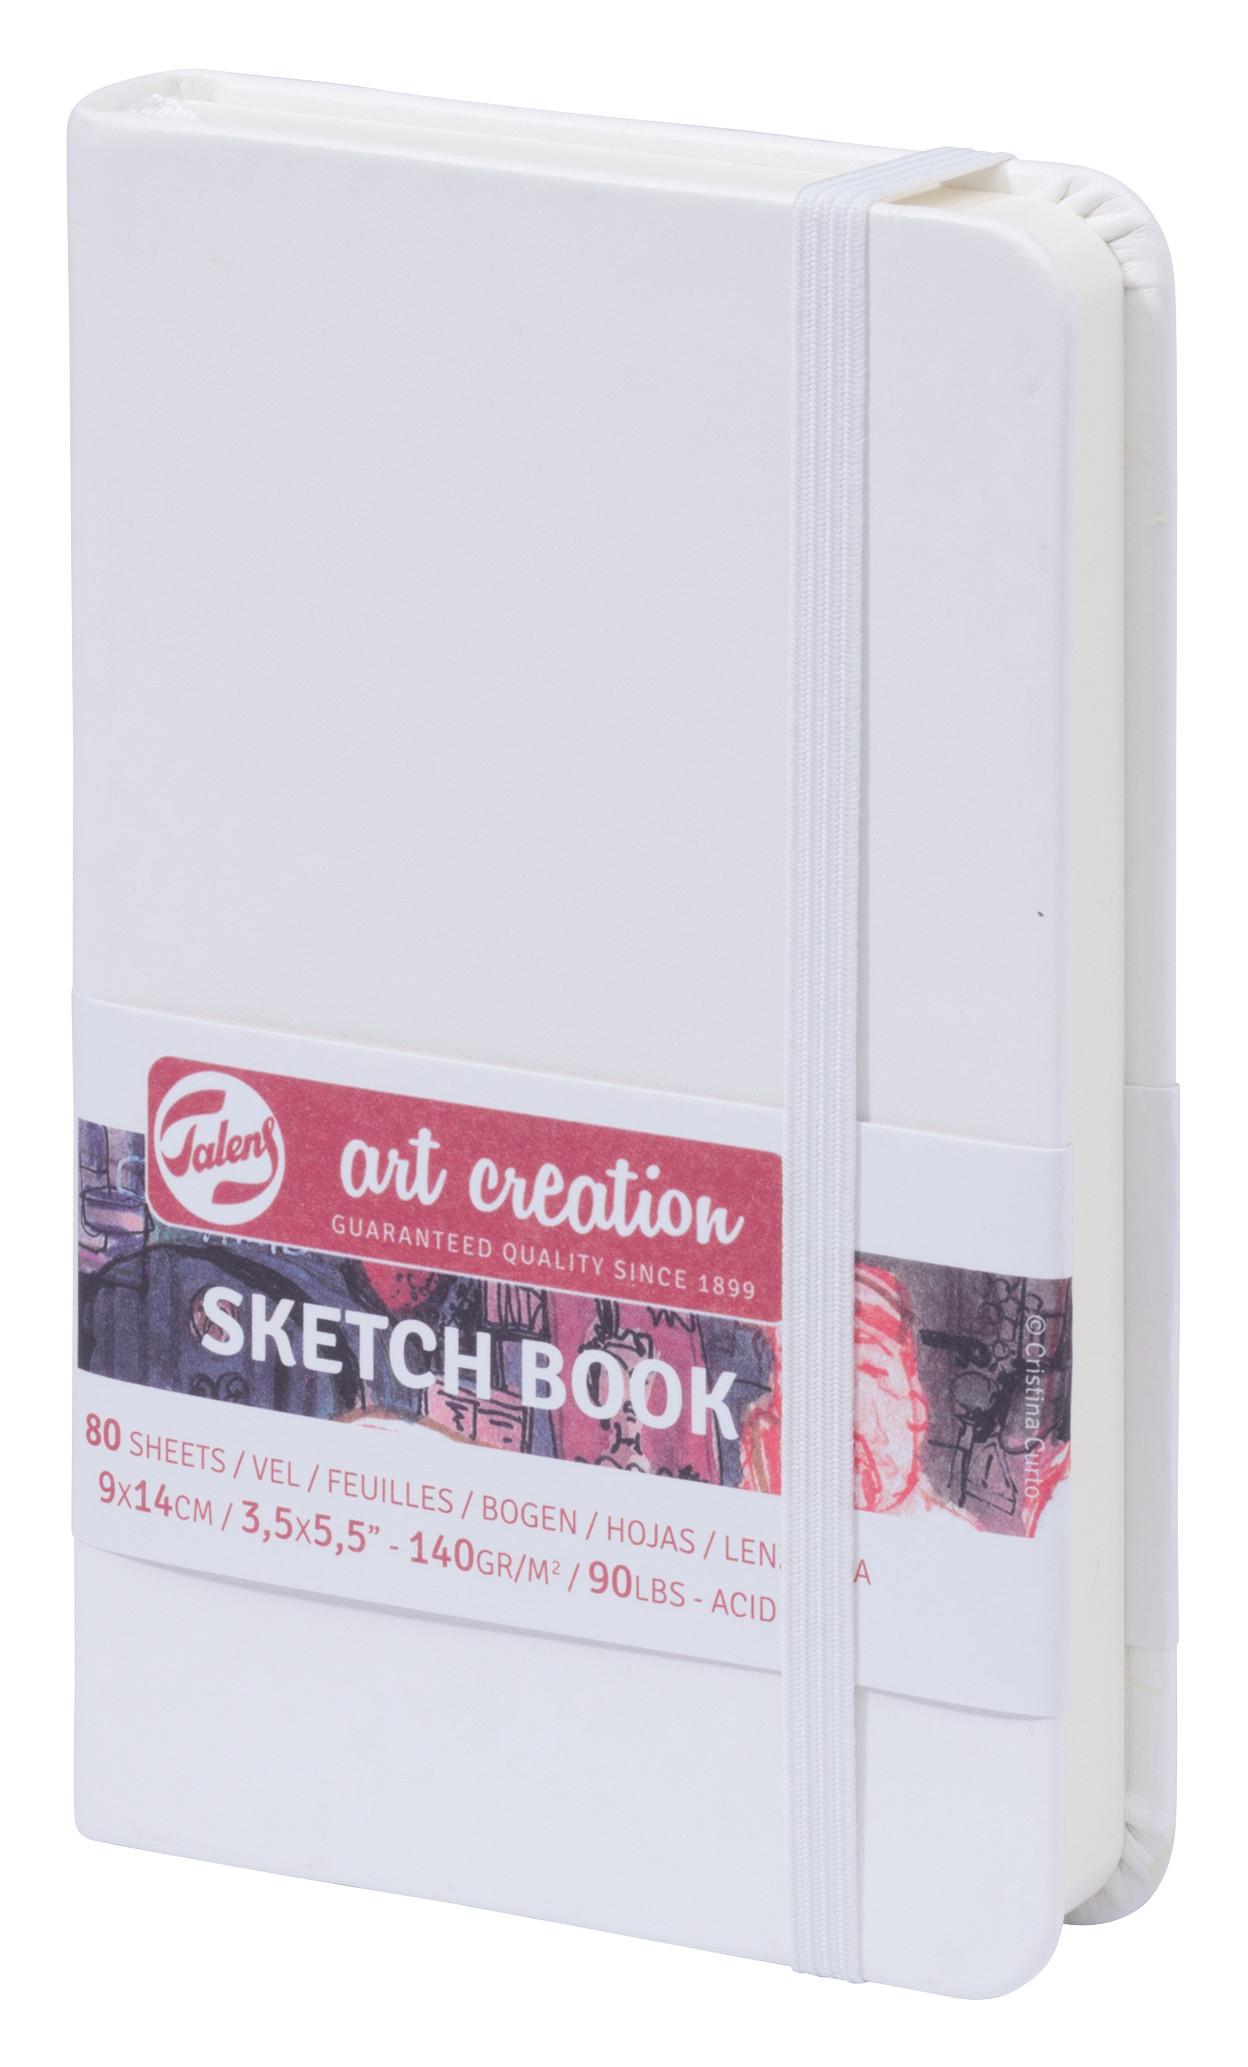 Talens Art Creation Sketchbook White 9X14 cm, 140 Grams